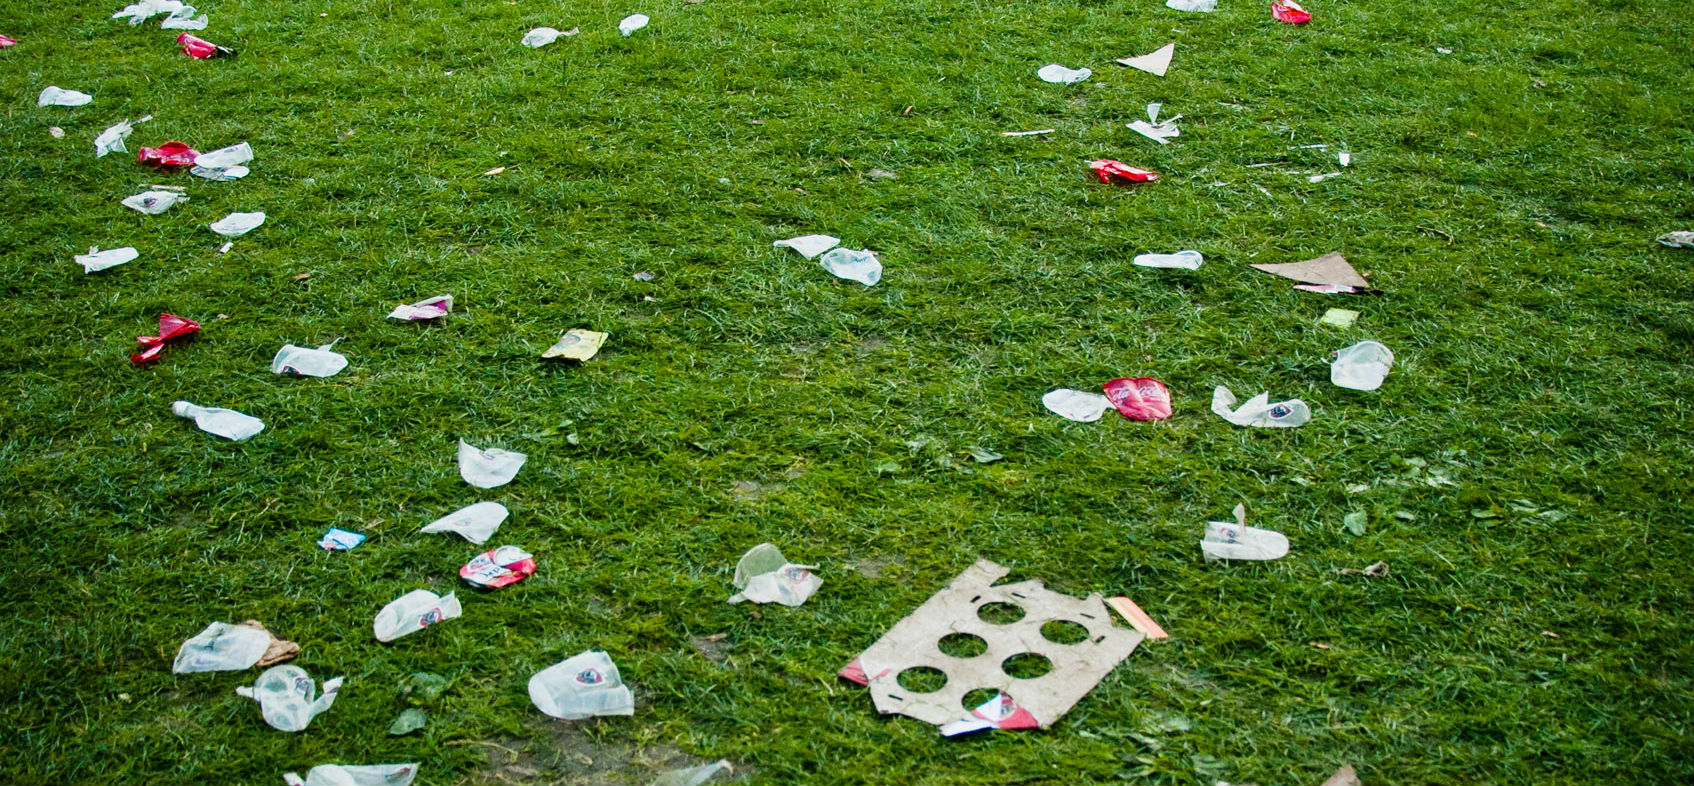 Een grasveld na een drukbezocht festival.